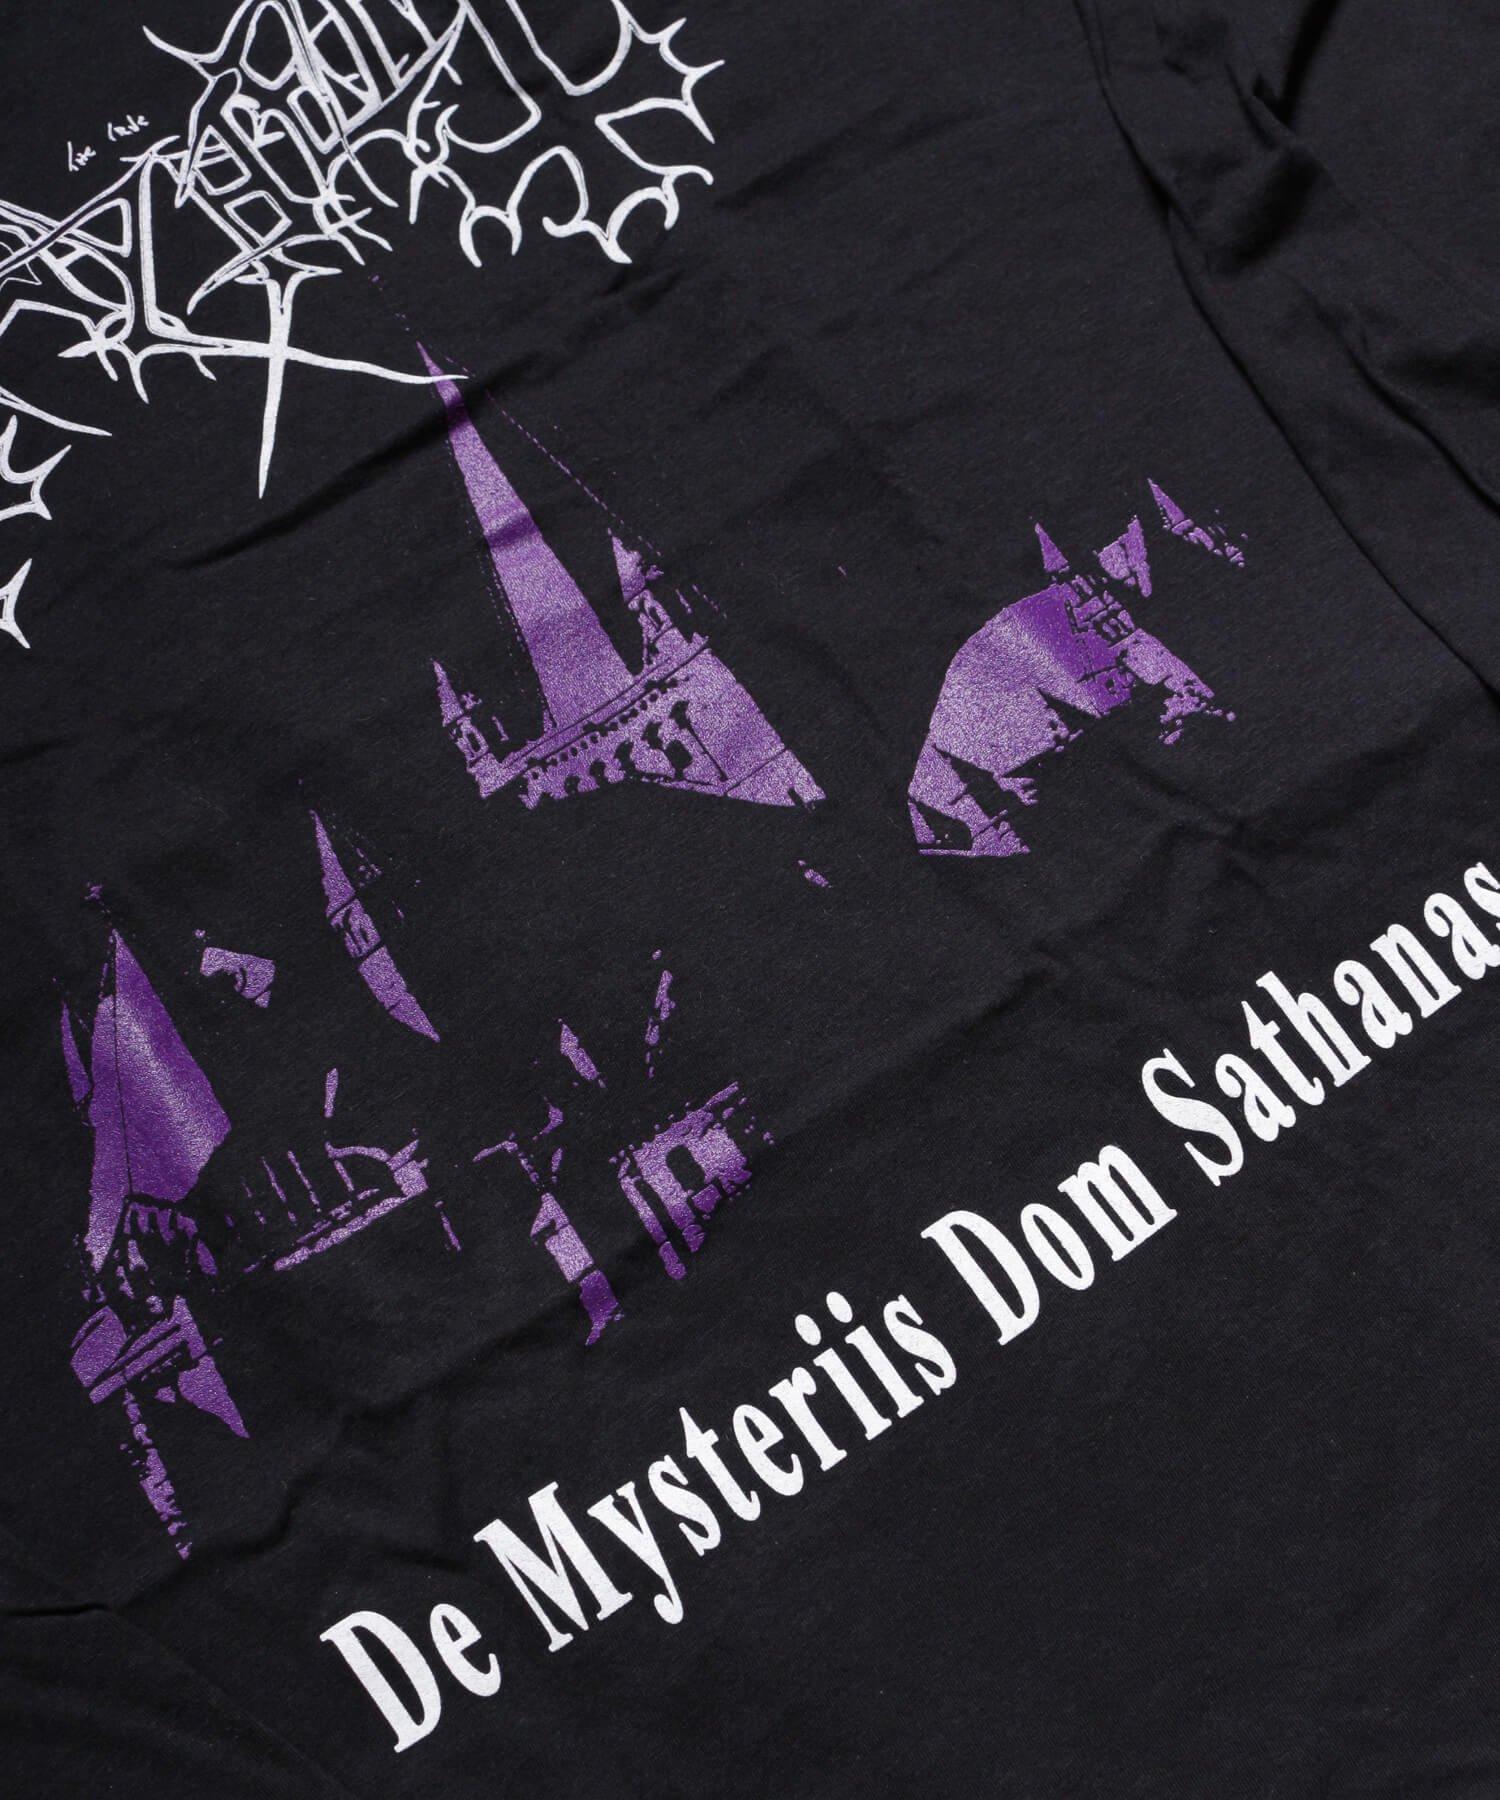 Official Artist Goods / バンドTなど |MAYHEM / メイヘム:DE MYSTERIIS DOM SATHANAS LONG SLEEVE SHIRT (BLACK) 商品画像6